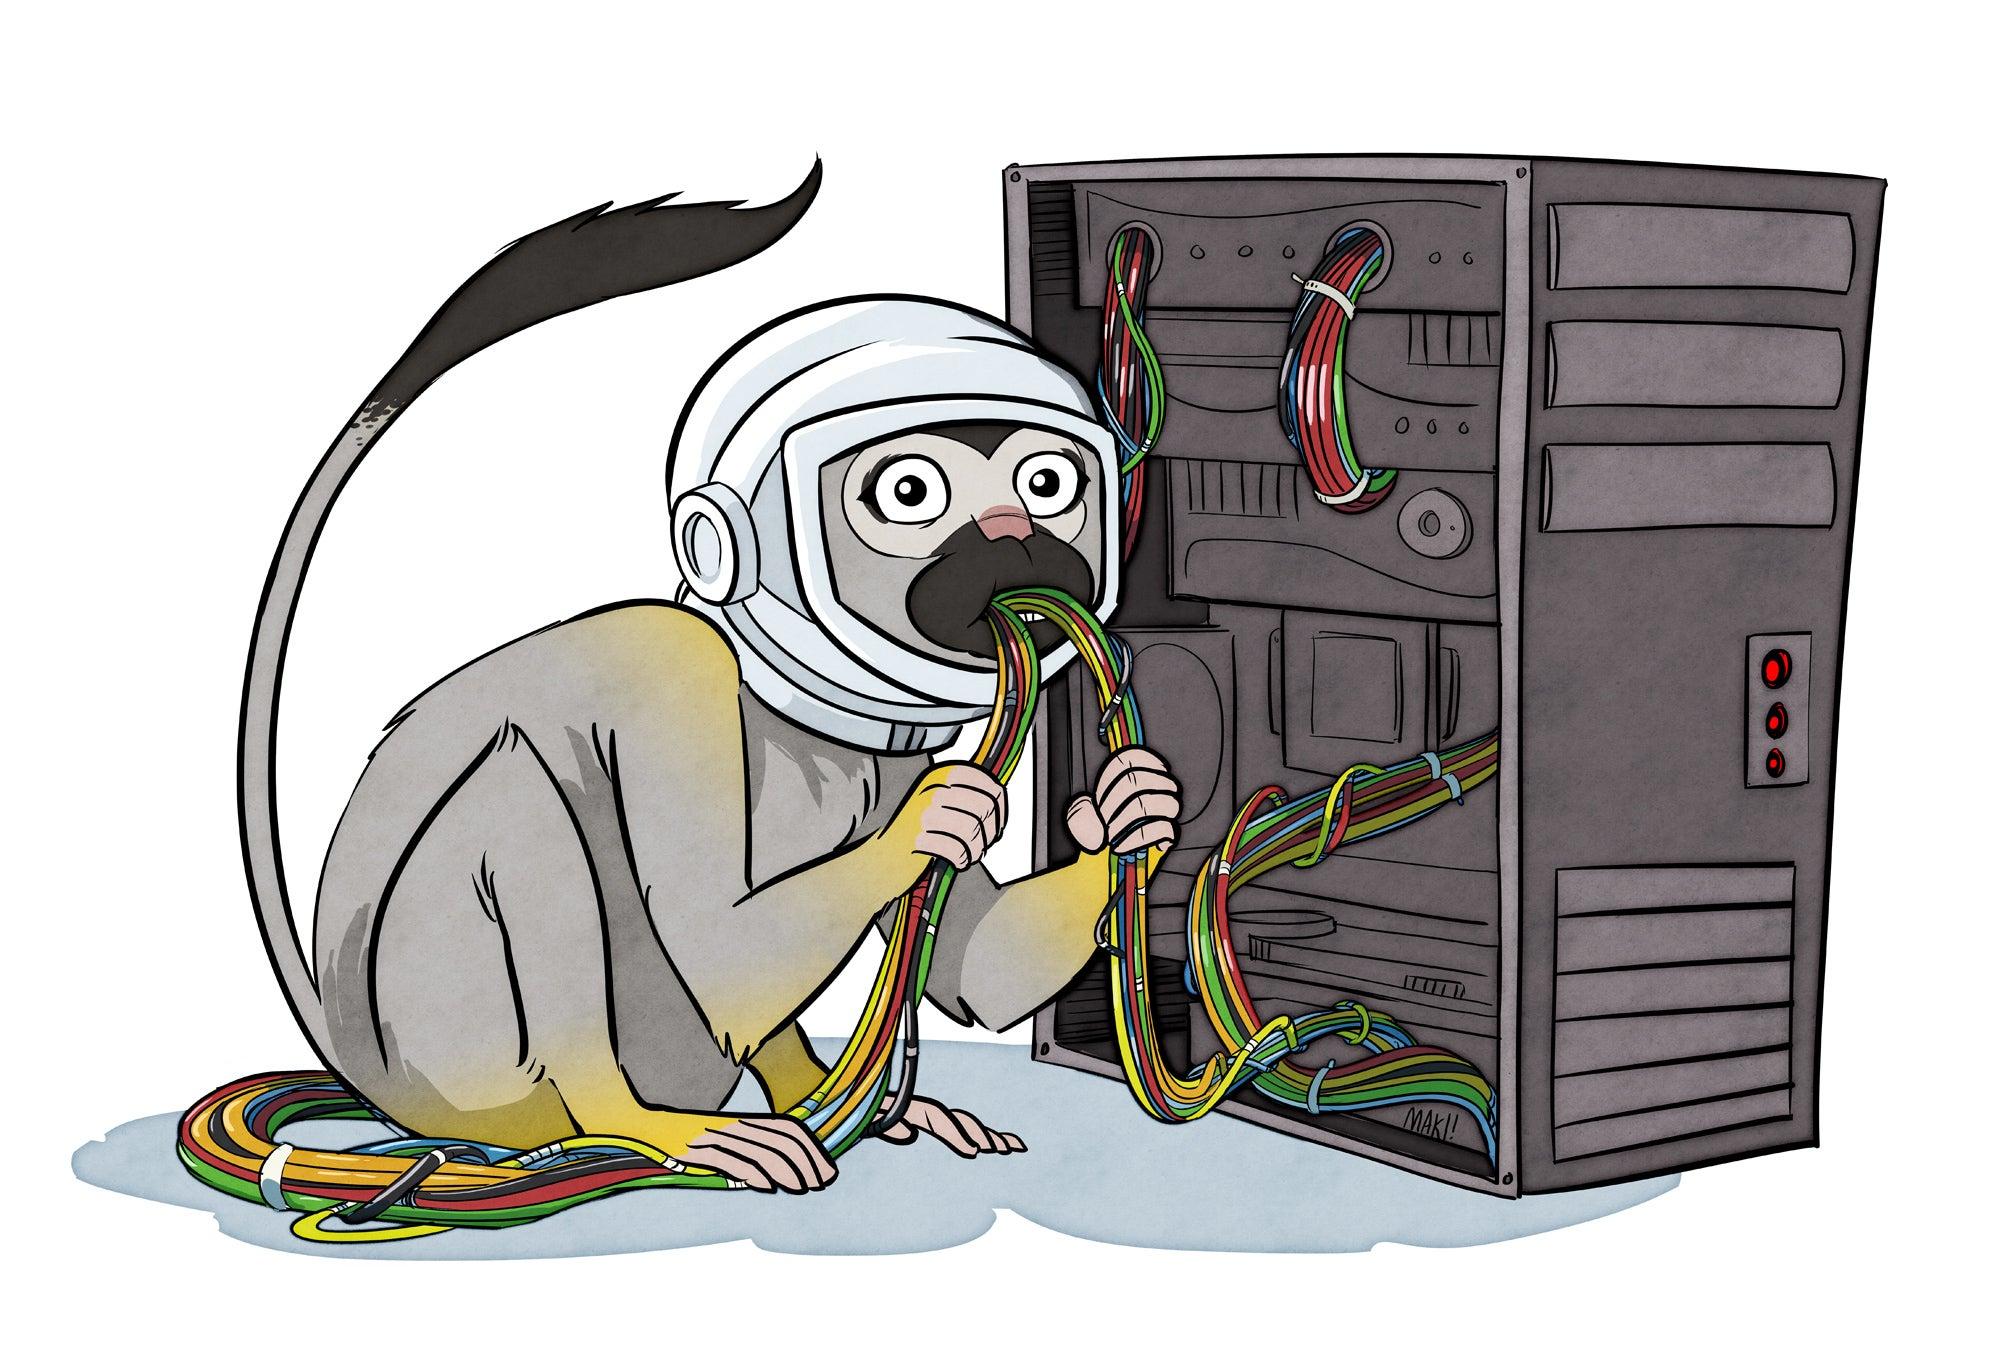 popular-science-404-miss-baker-monkey-by-maki-naro